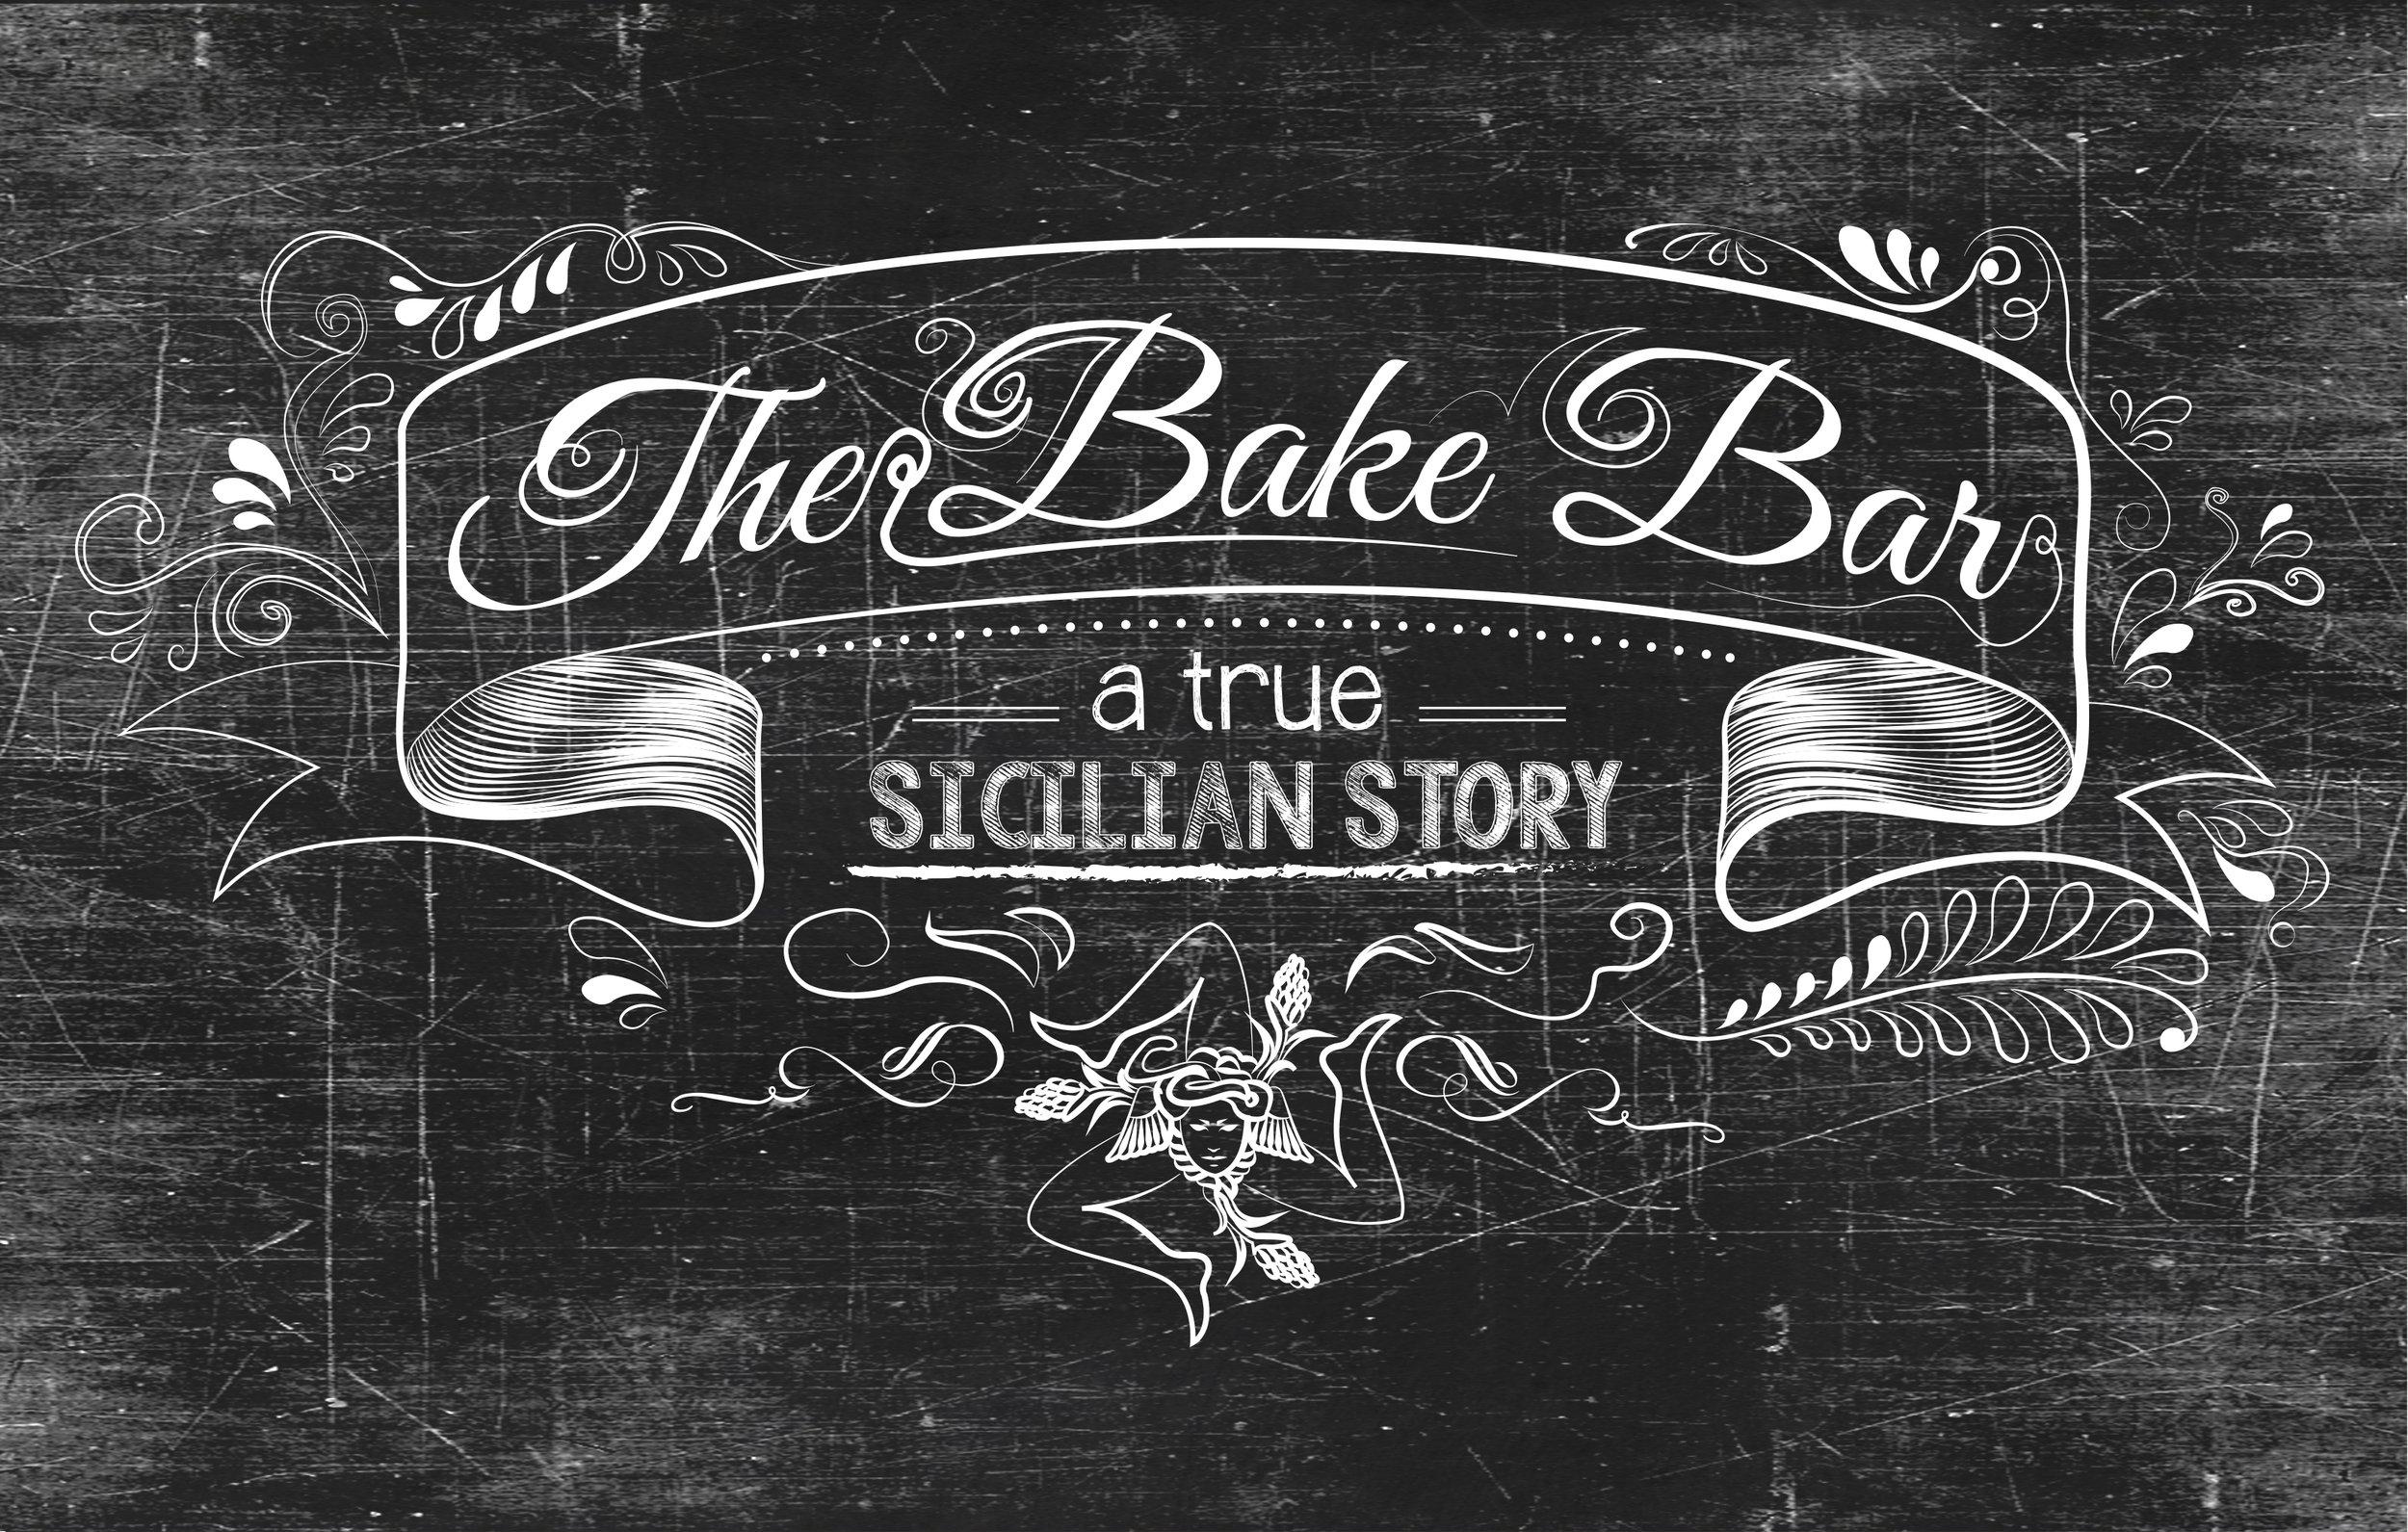 LogoBakeBar.jpg